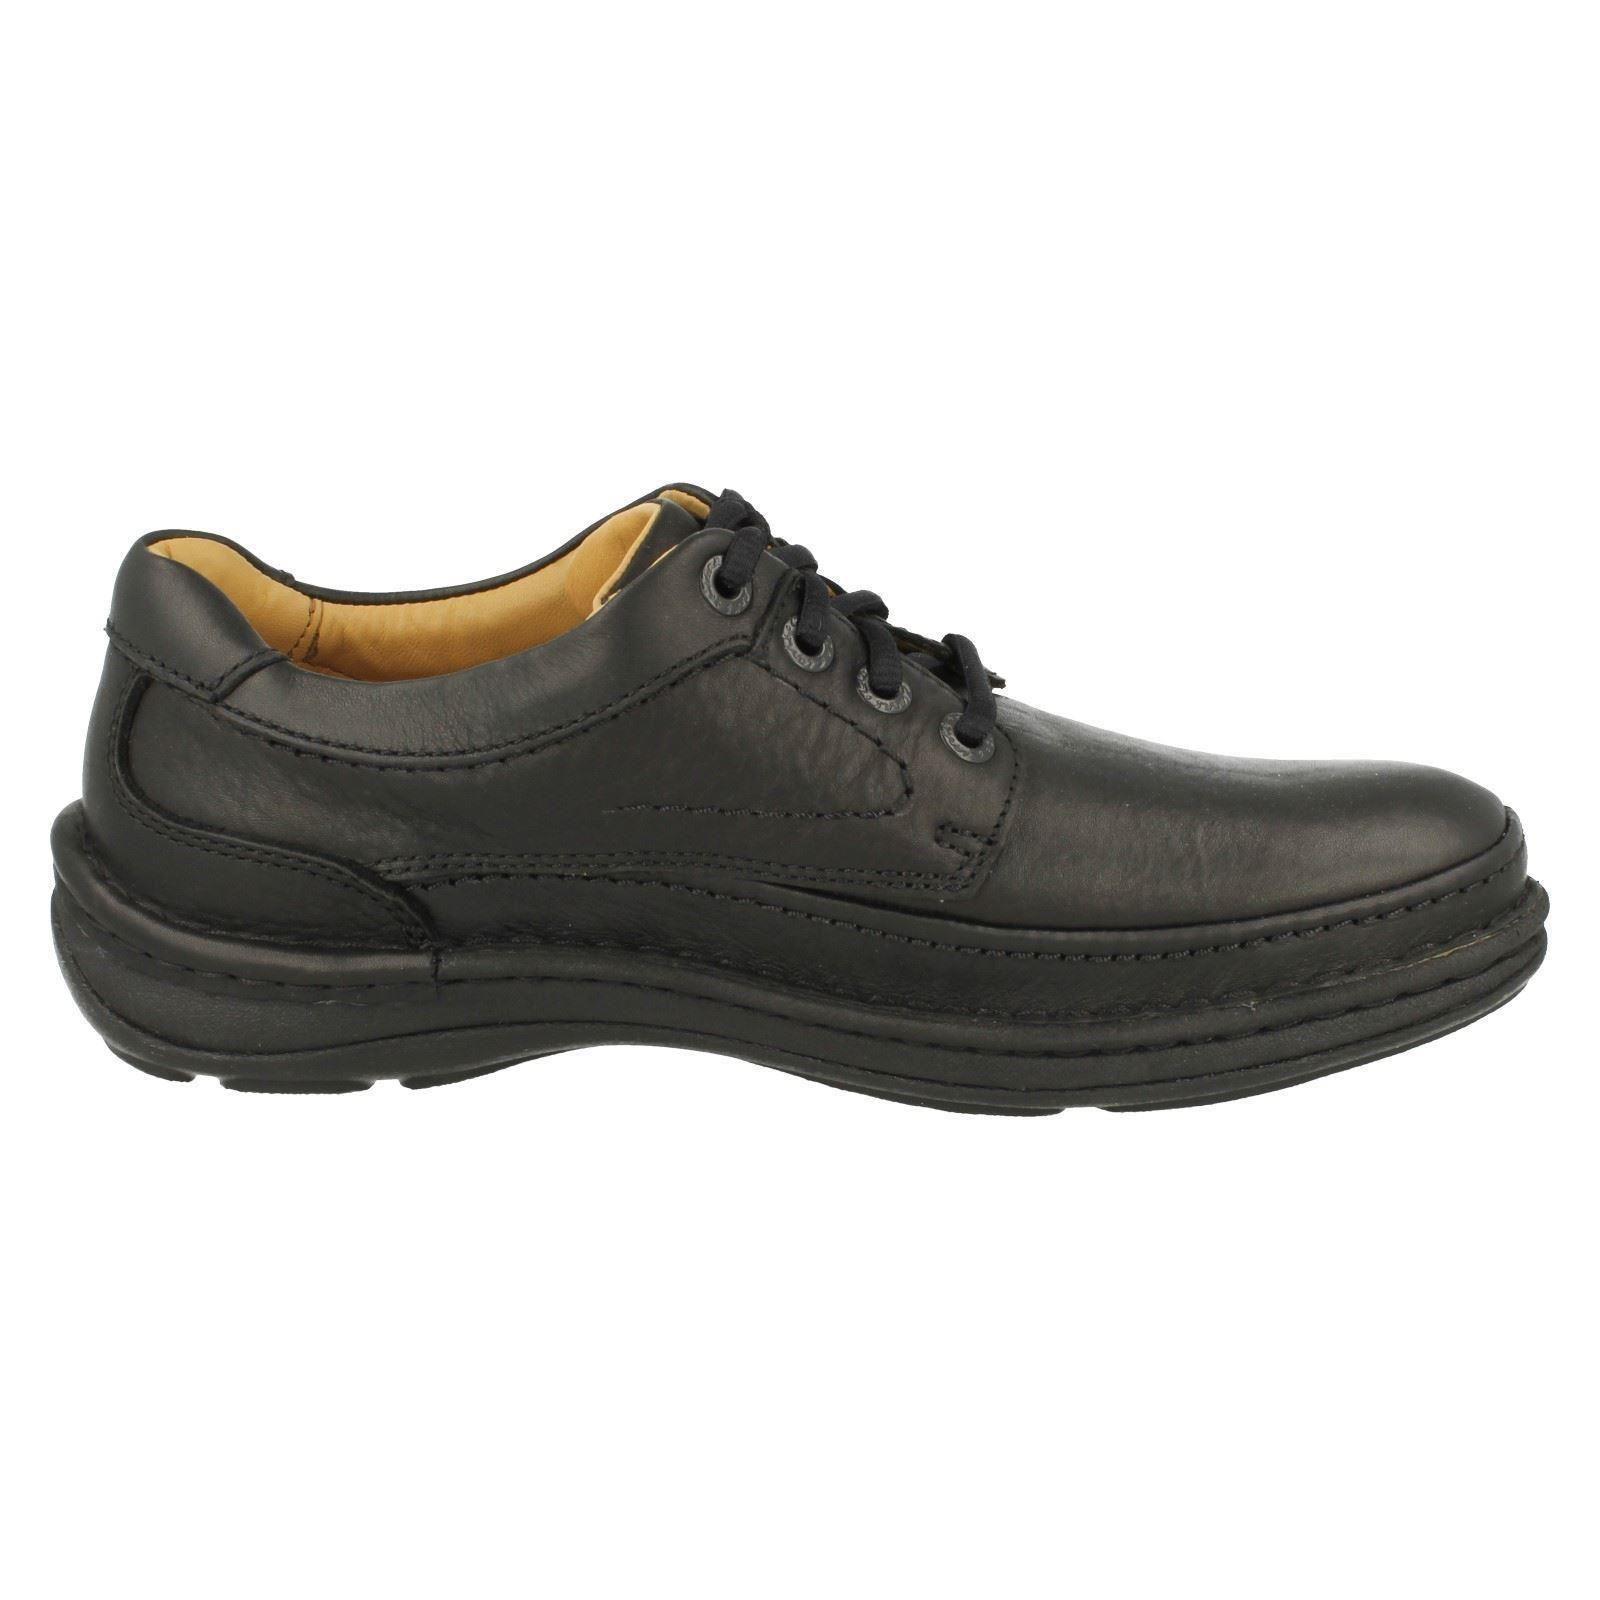 Herren  Herren  Clarks Active Air Lace Up Schuhes Nature Three 72c17c